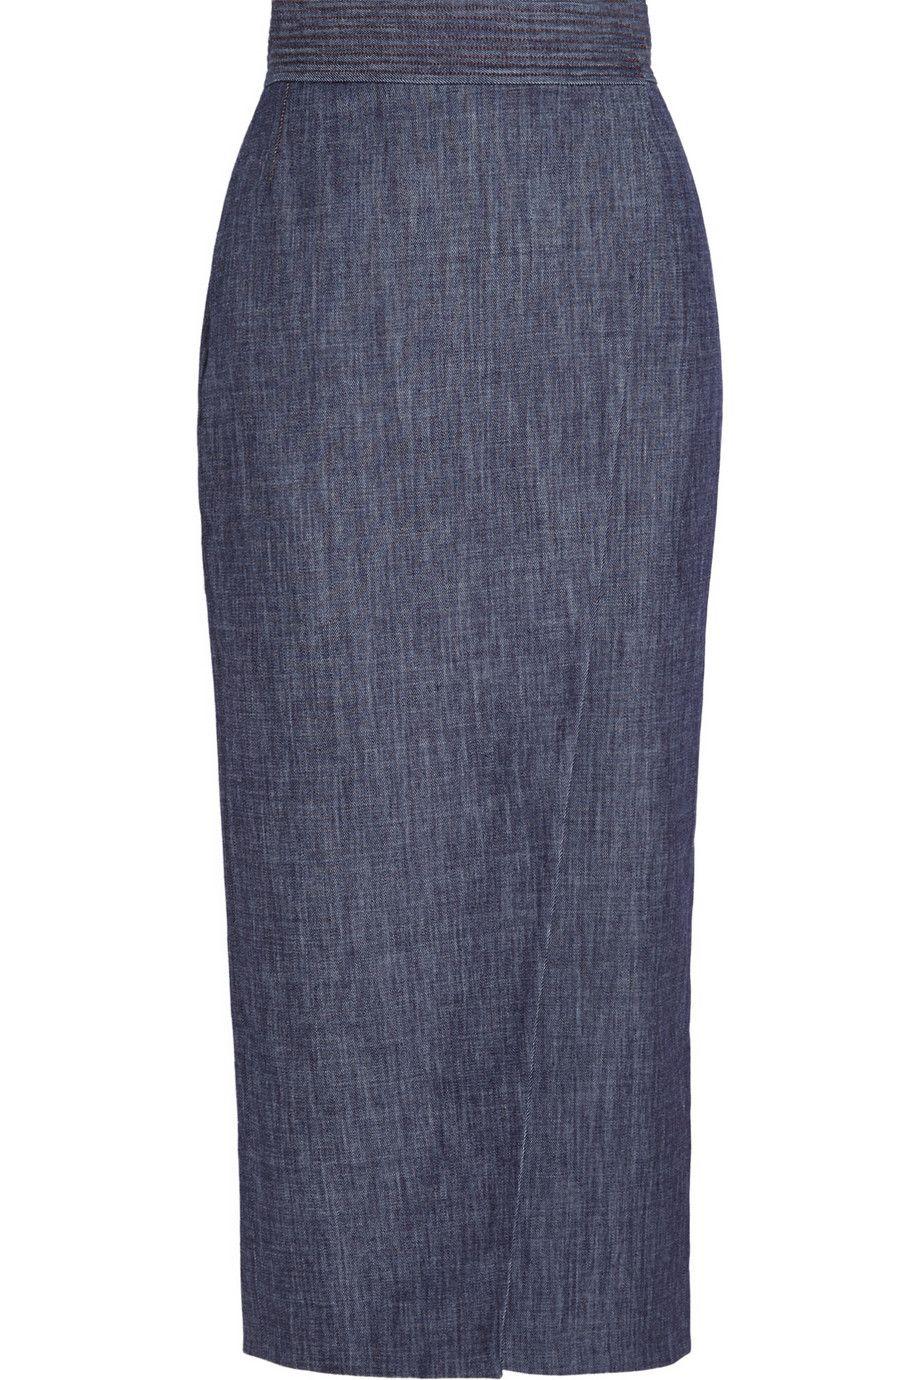 Adam Lippes|Wrap-effect denim midi skirt|NET-A-PORTER.COM